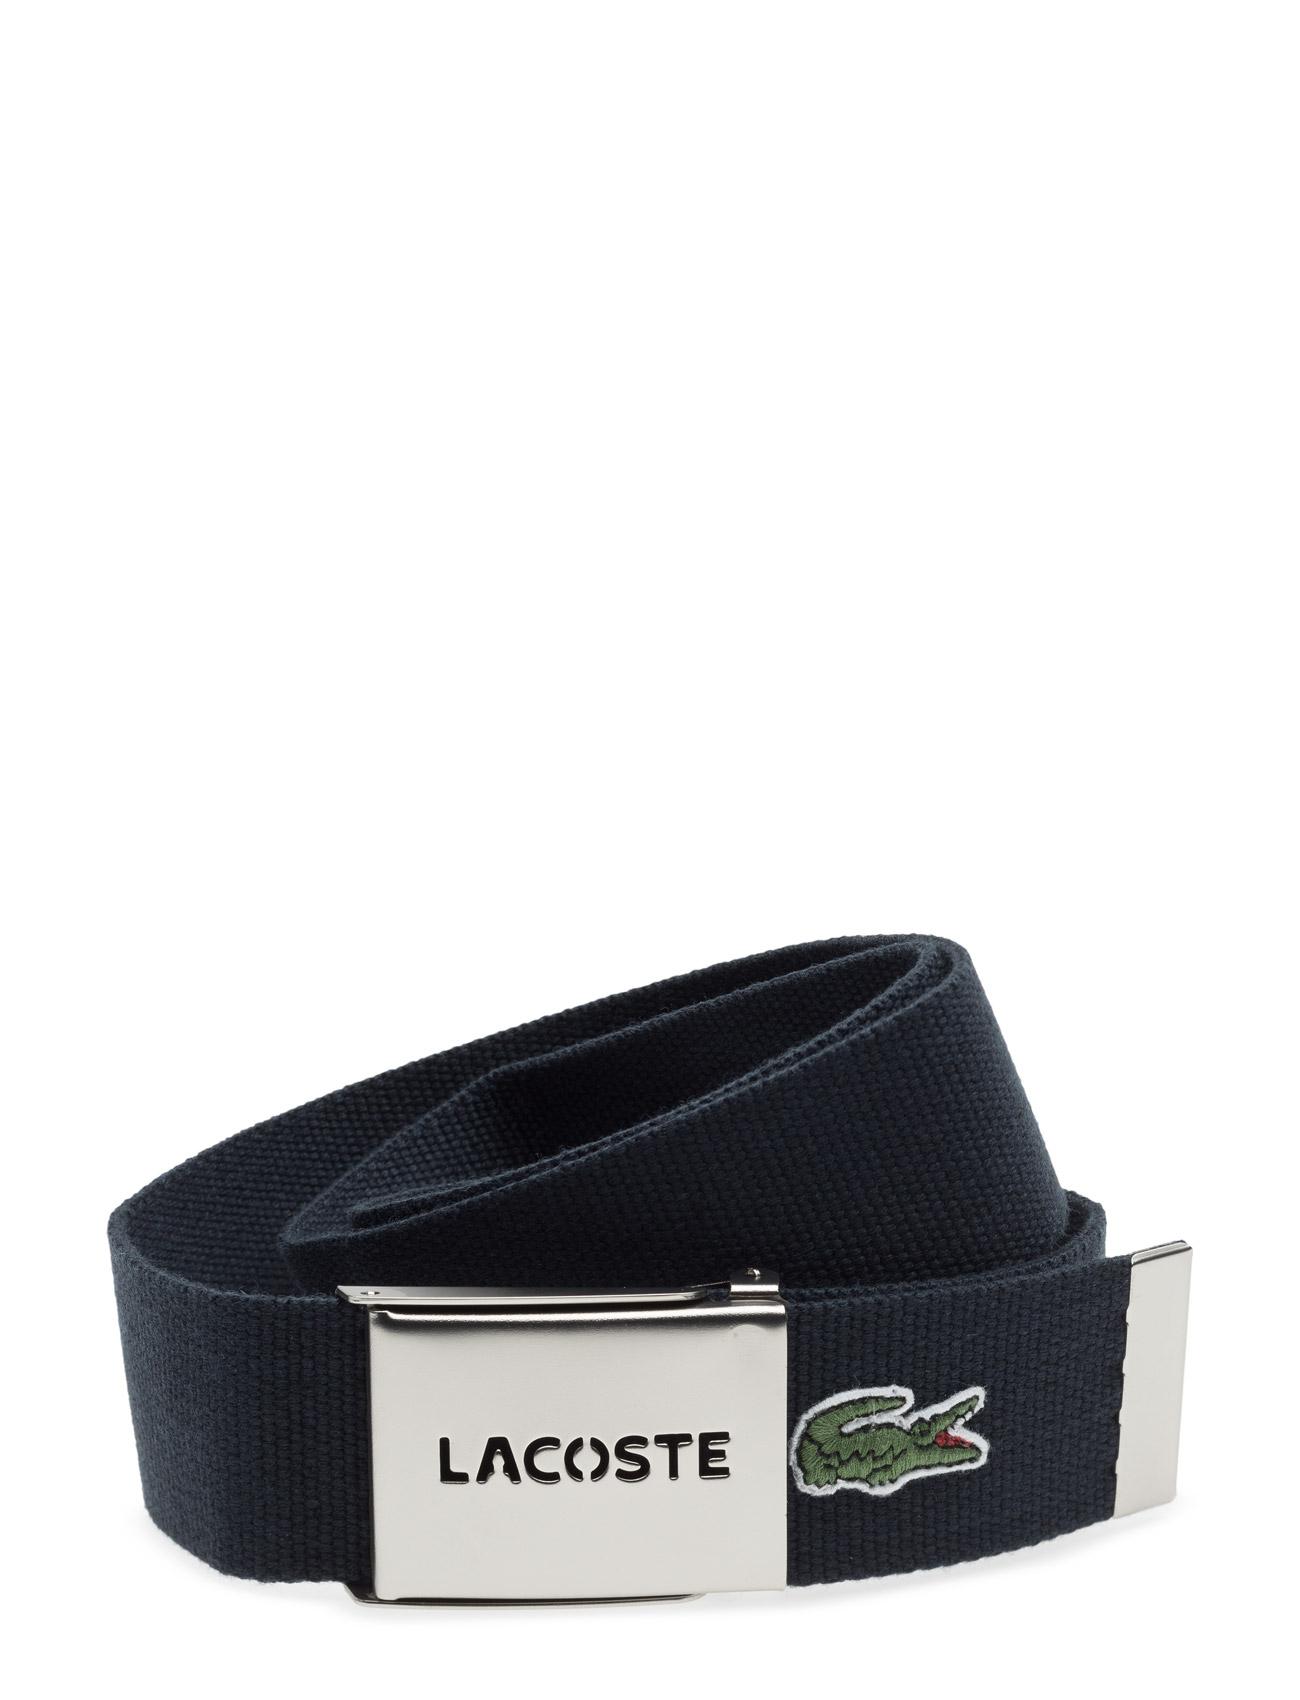 Leather Goods Belt Lacoste Bælter til Herrer i Navy blå